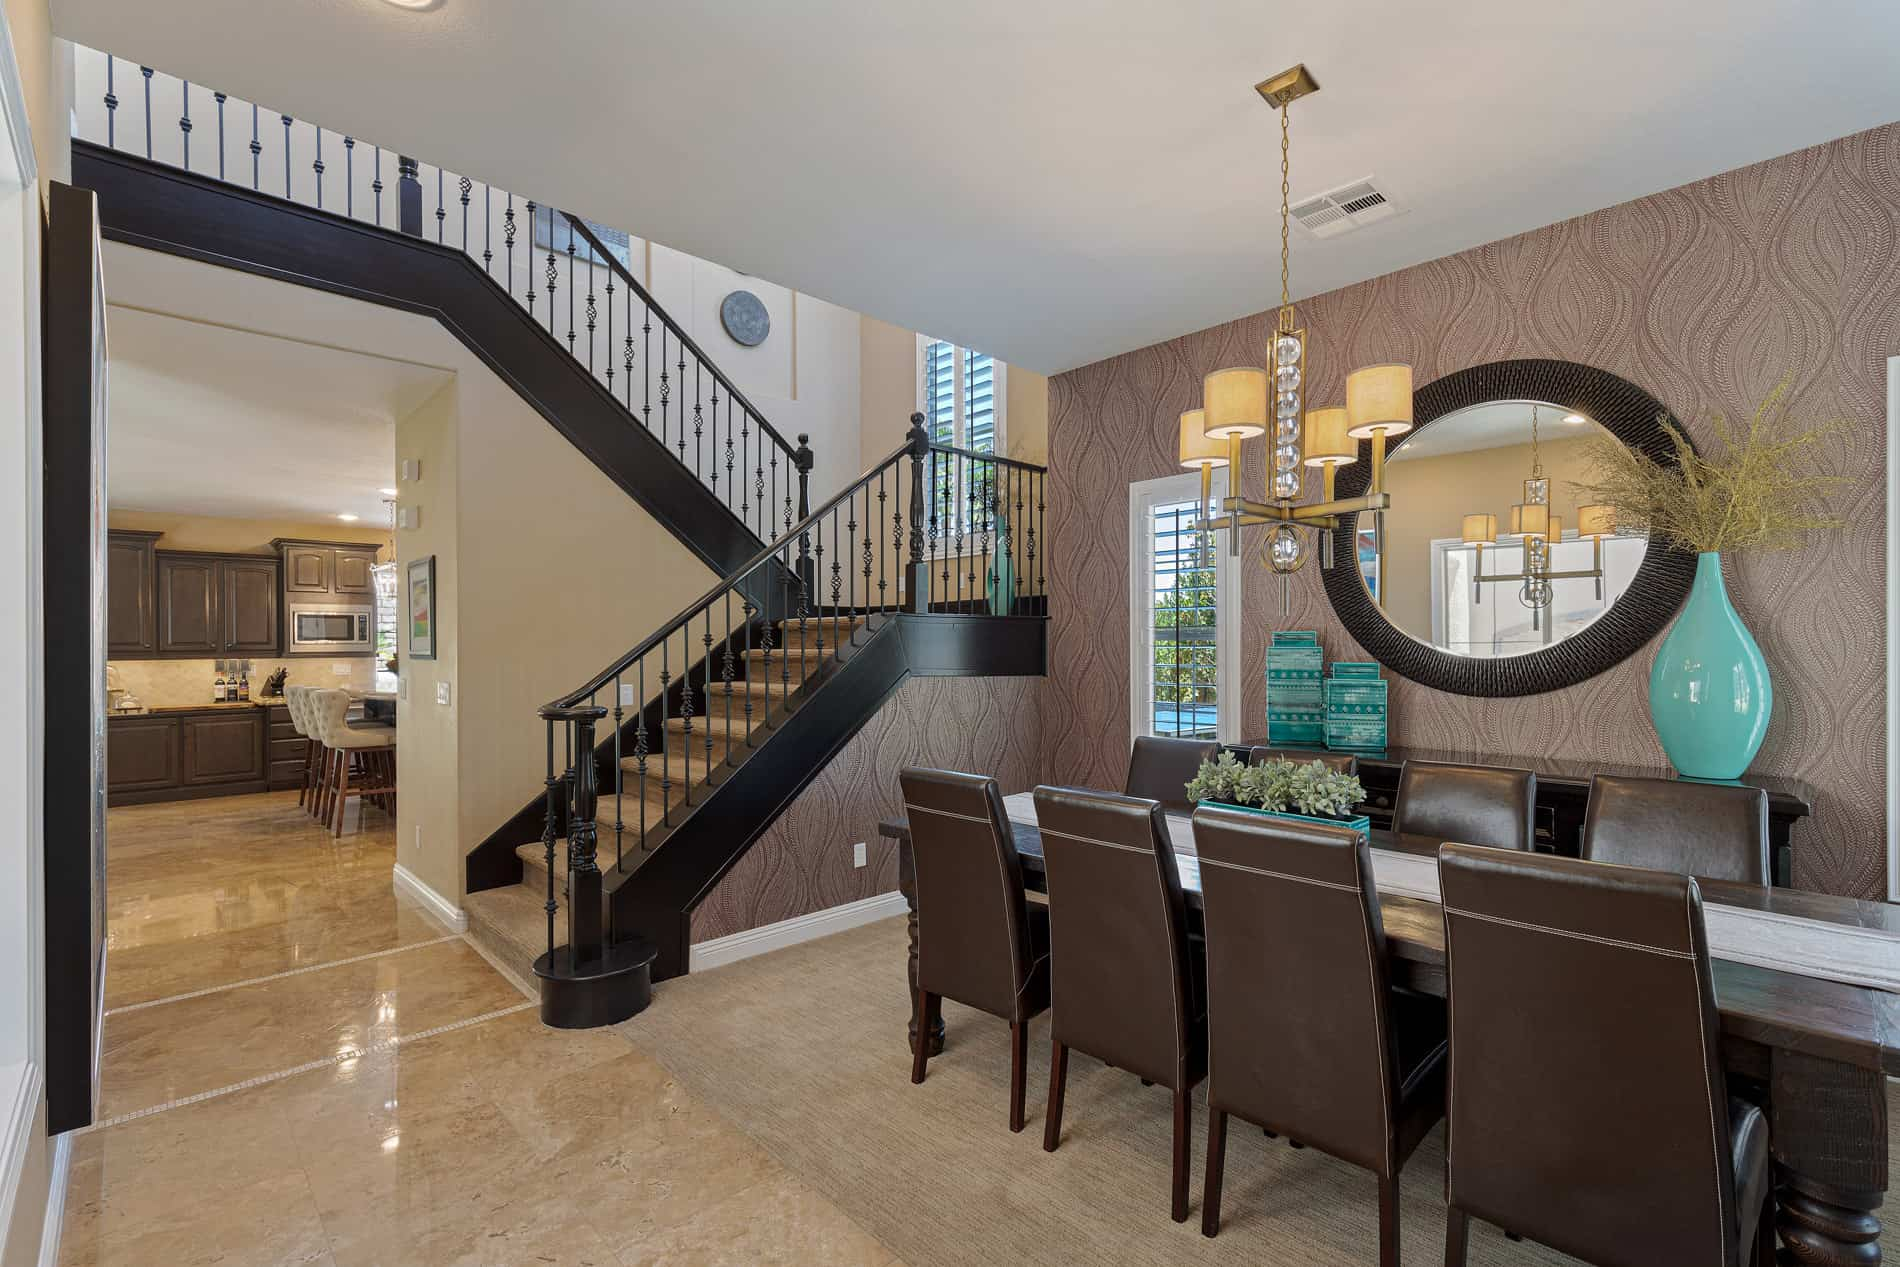 las-vegas-luxry-real-estate-realtor-rob-jensen-company-12108-vista-linda-avenue-the-paseos008